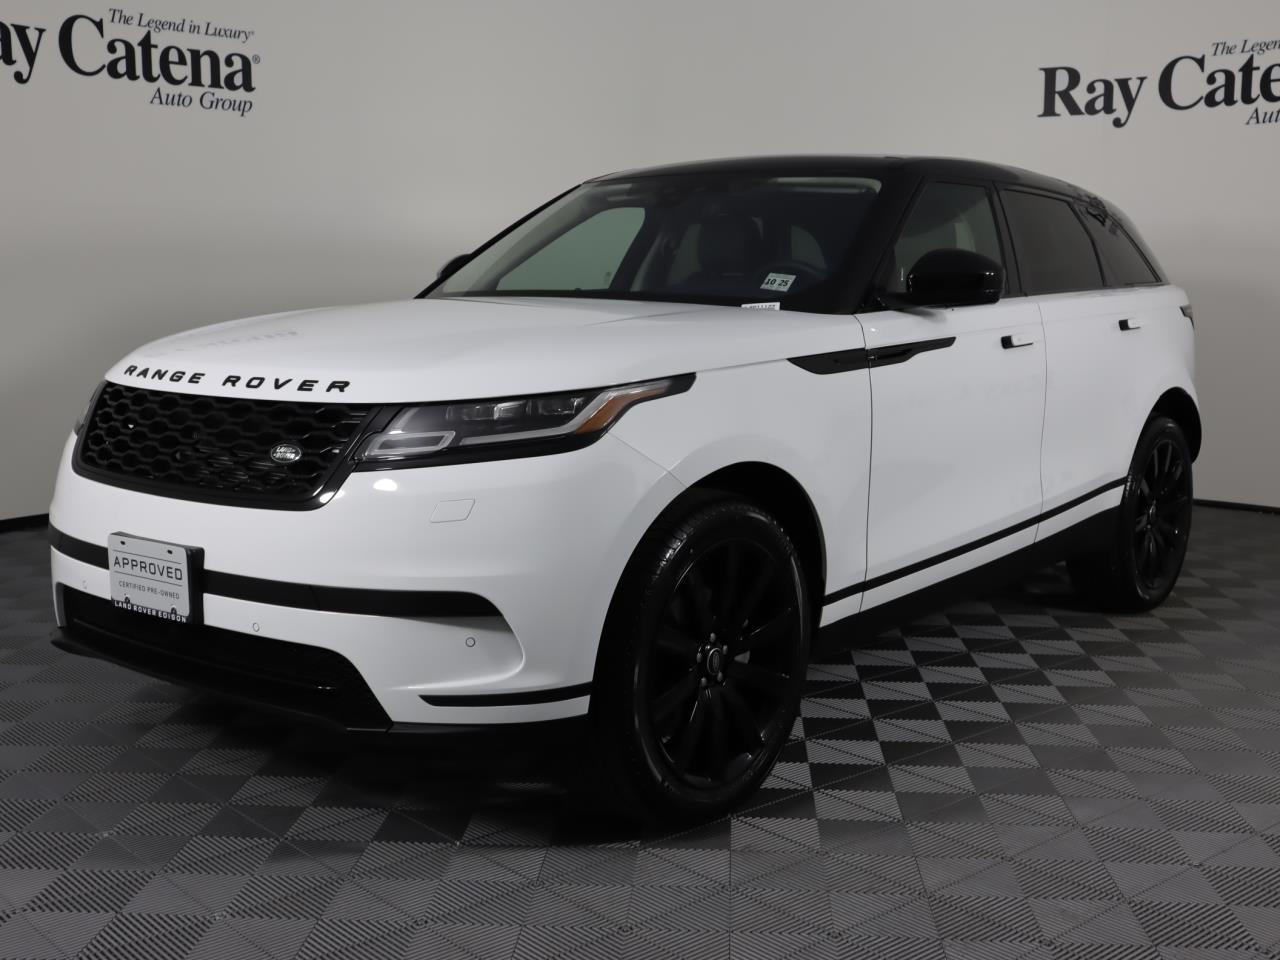 Certified Pre-Owned 2020 Land Rover Range Rover Velar P250 S